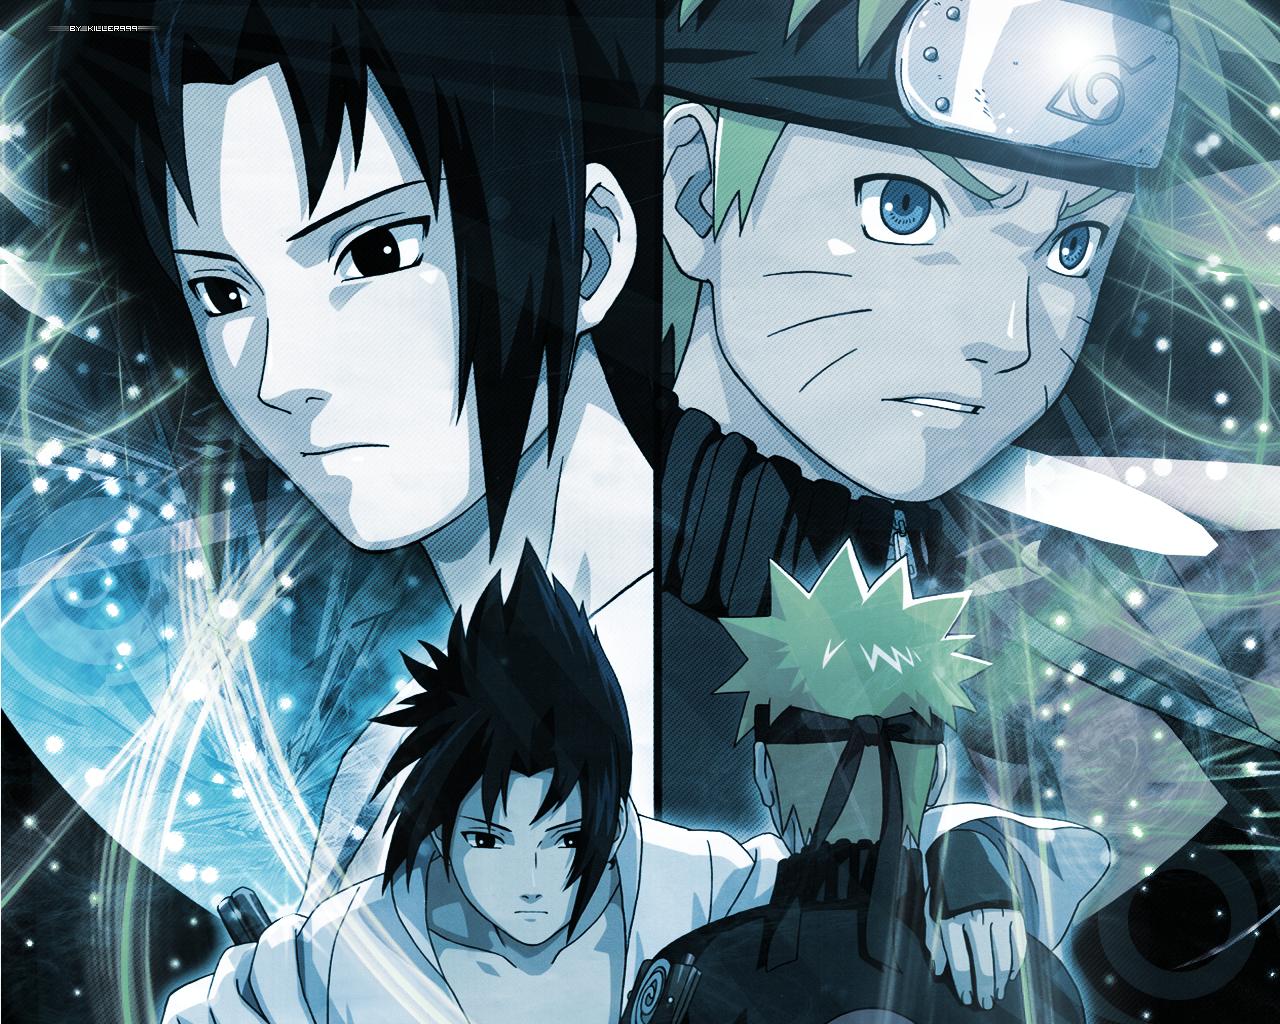 Simple Wallpaper Naruto Blue - naruto_portugal_wallpaper_v_2_by_angelus_killer999  Image_77641.png